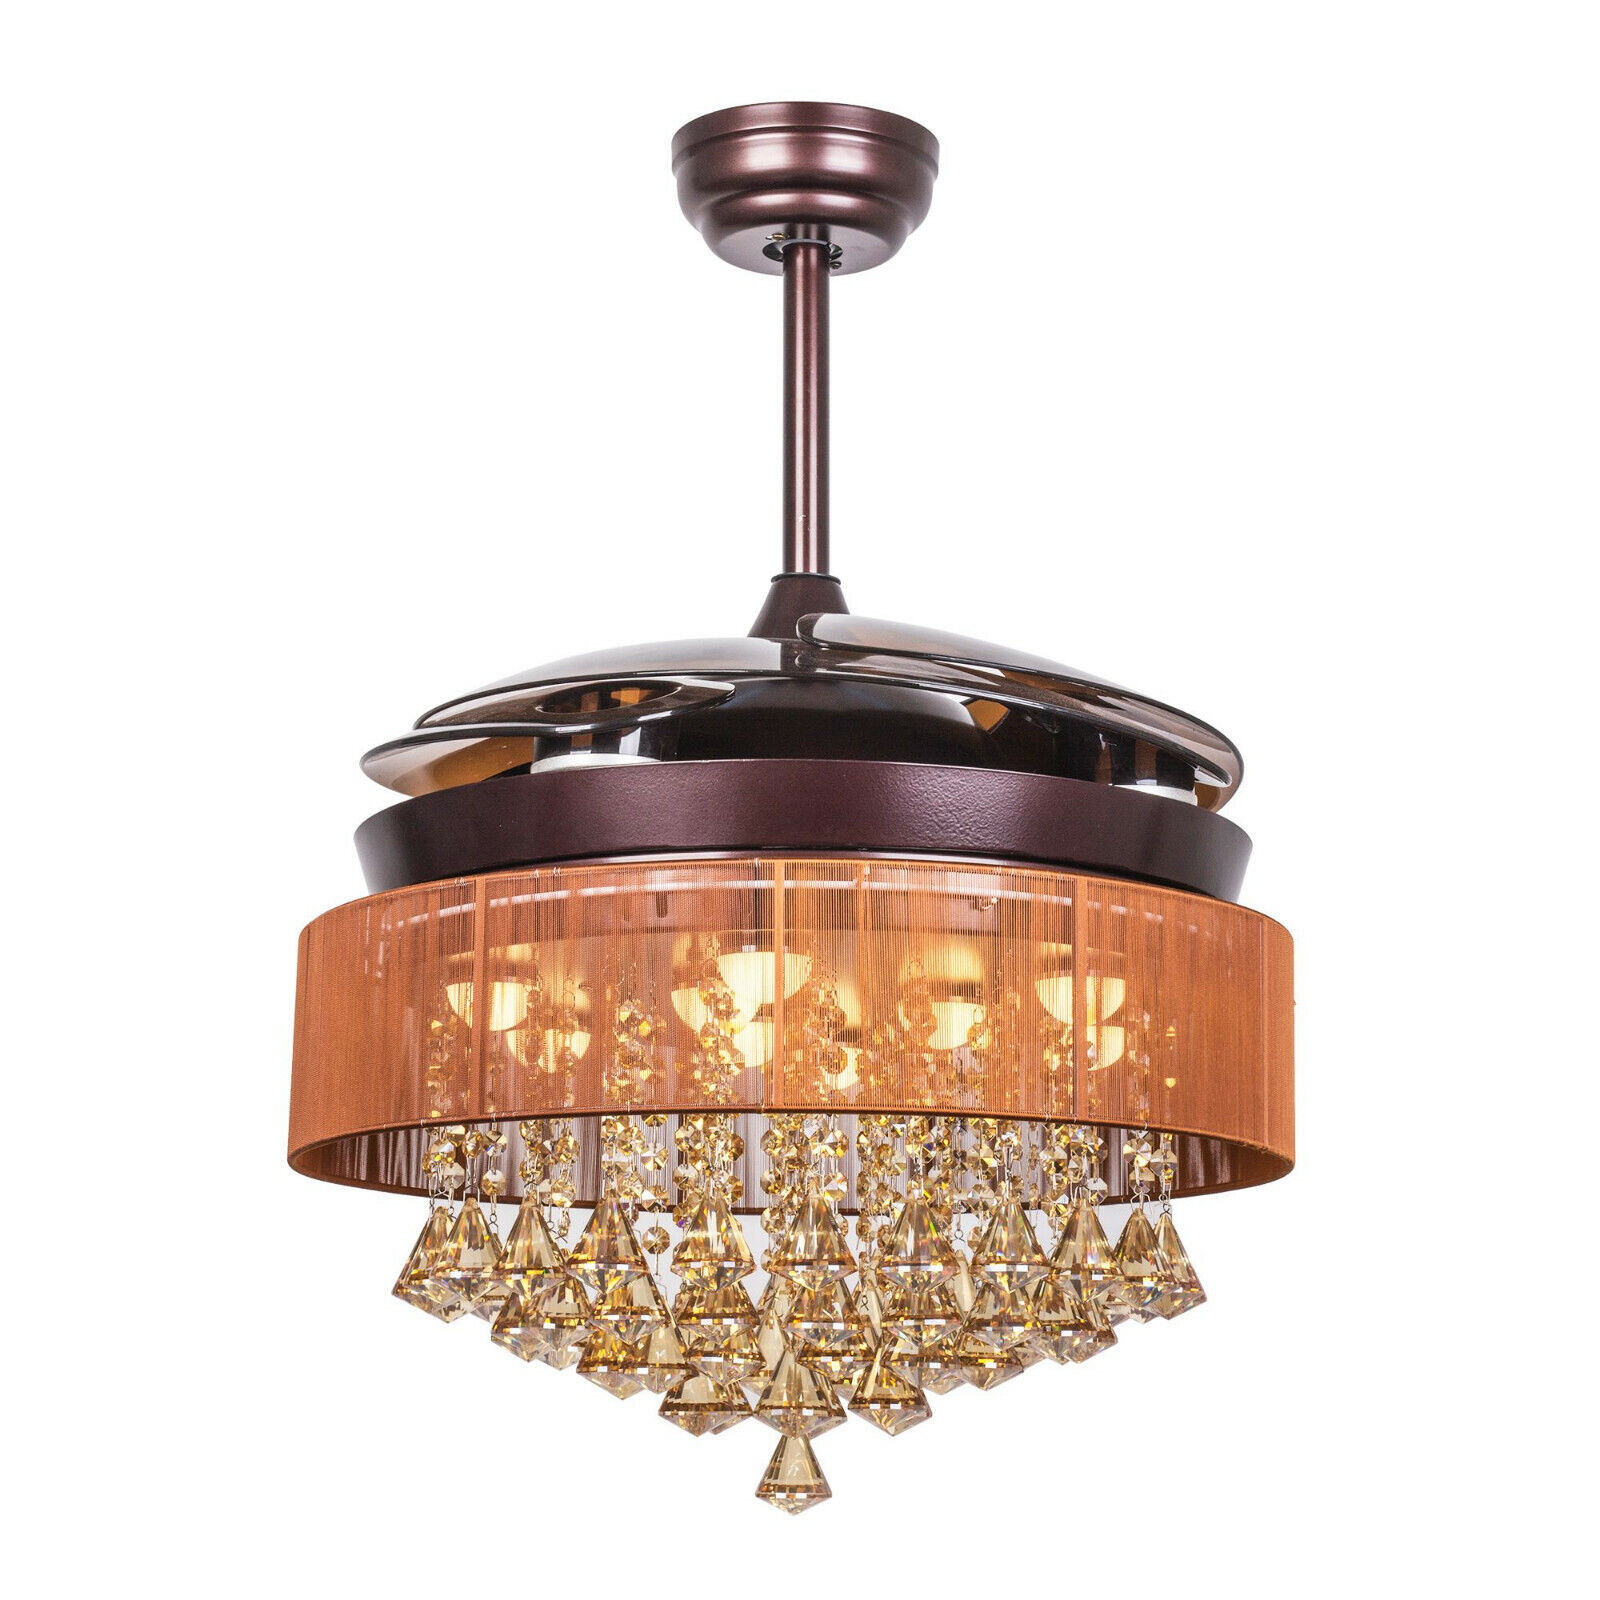 Image of: 46 Crystal Ceiling Fan Lights Tiendamia Com